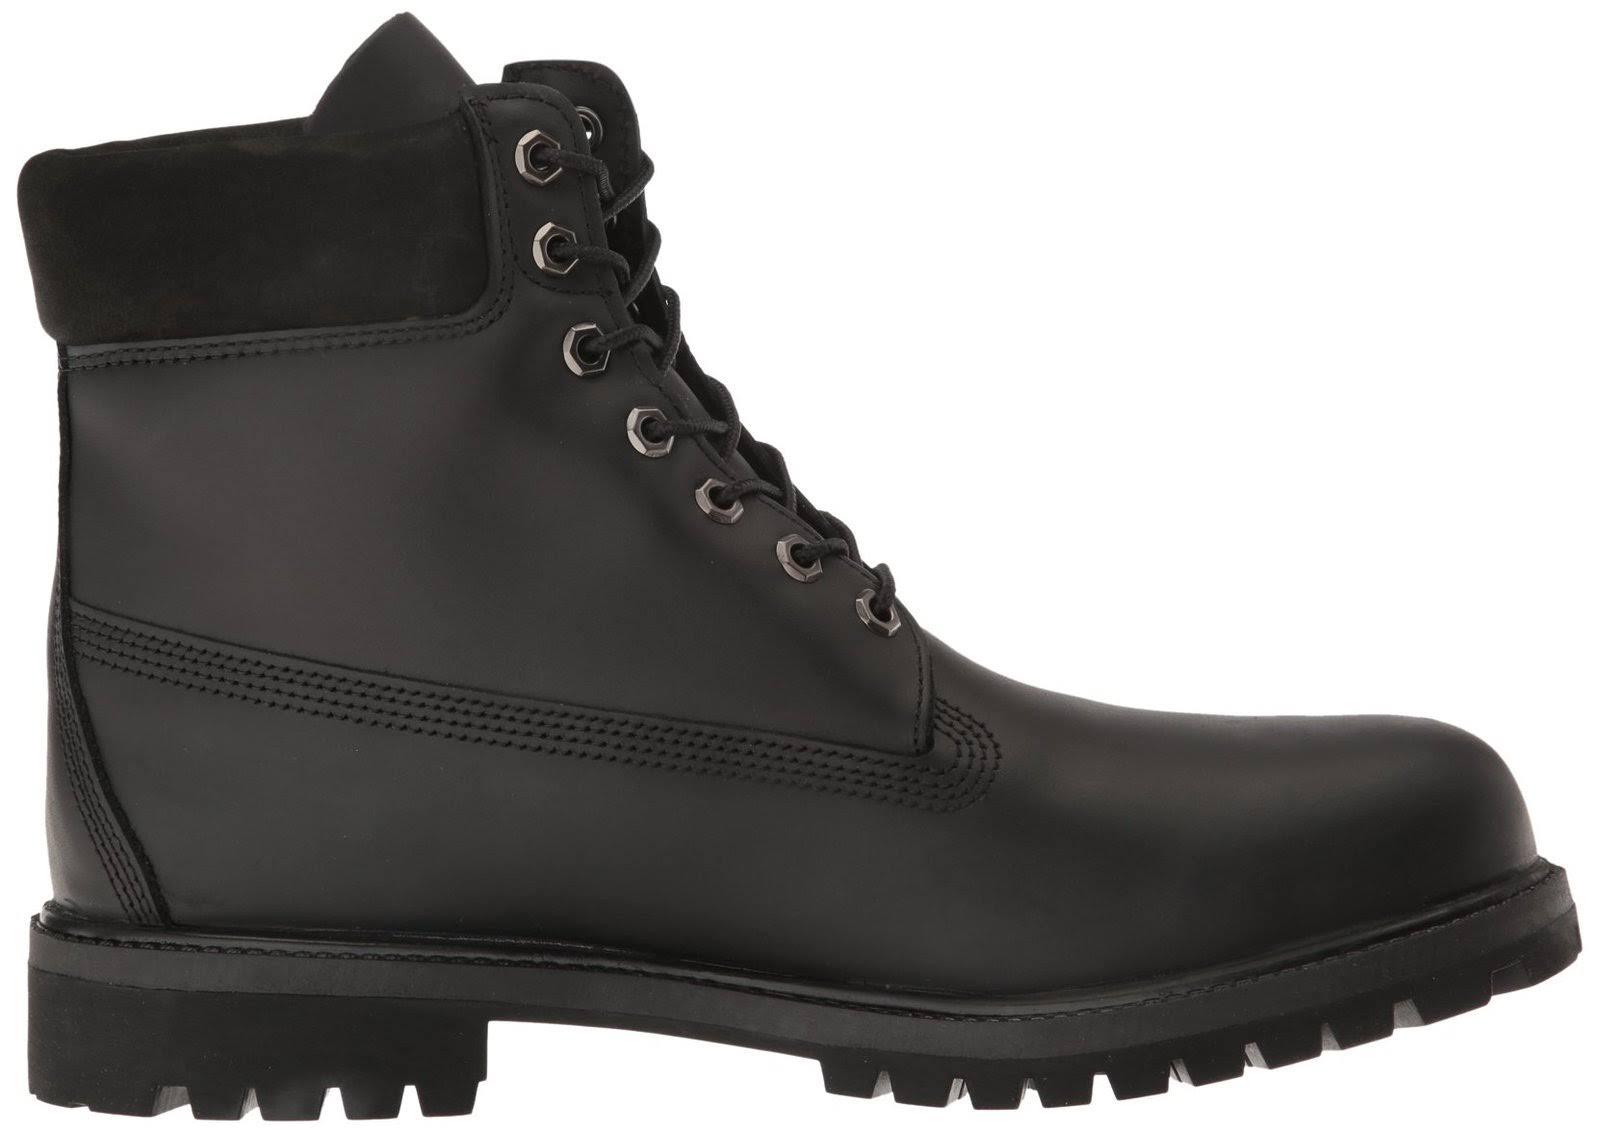 5 pelle Wheat nera 35 in Eup 12909m Timberland 2156 Boot impermeabile Premium 0wP8nkO